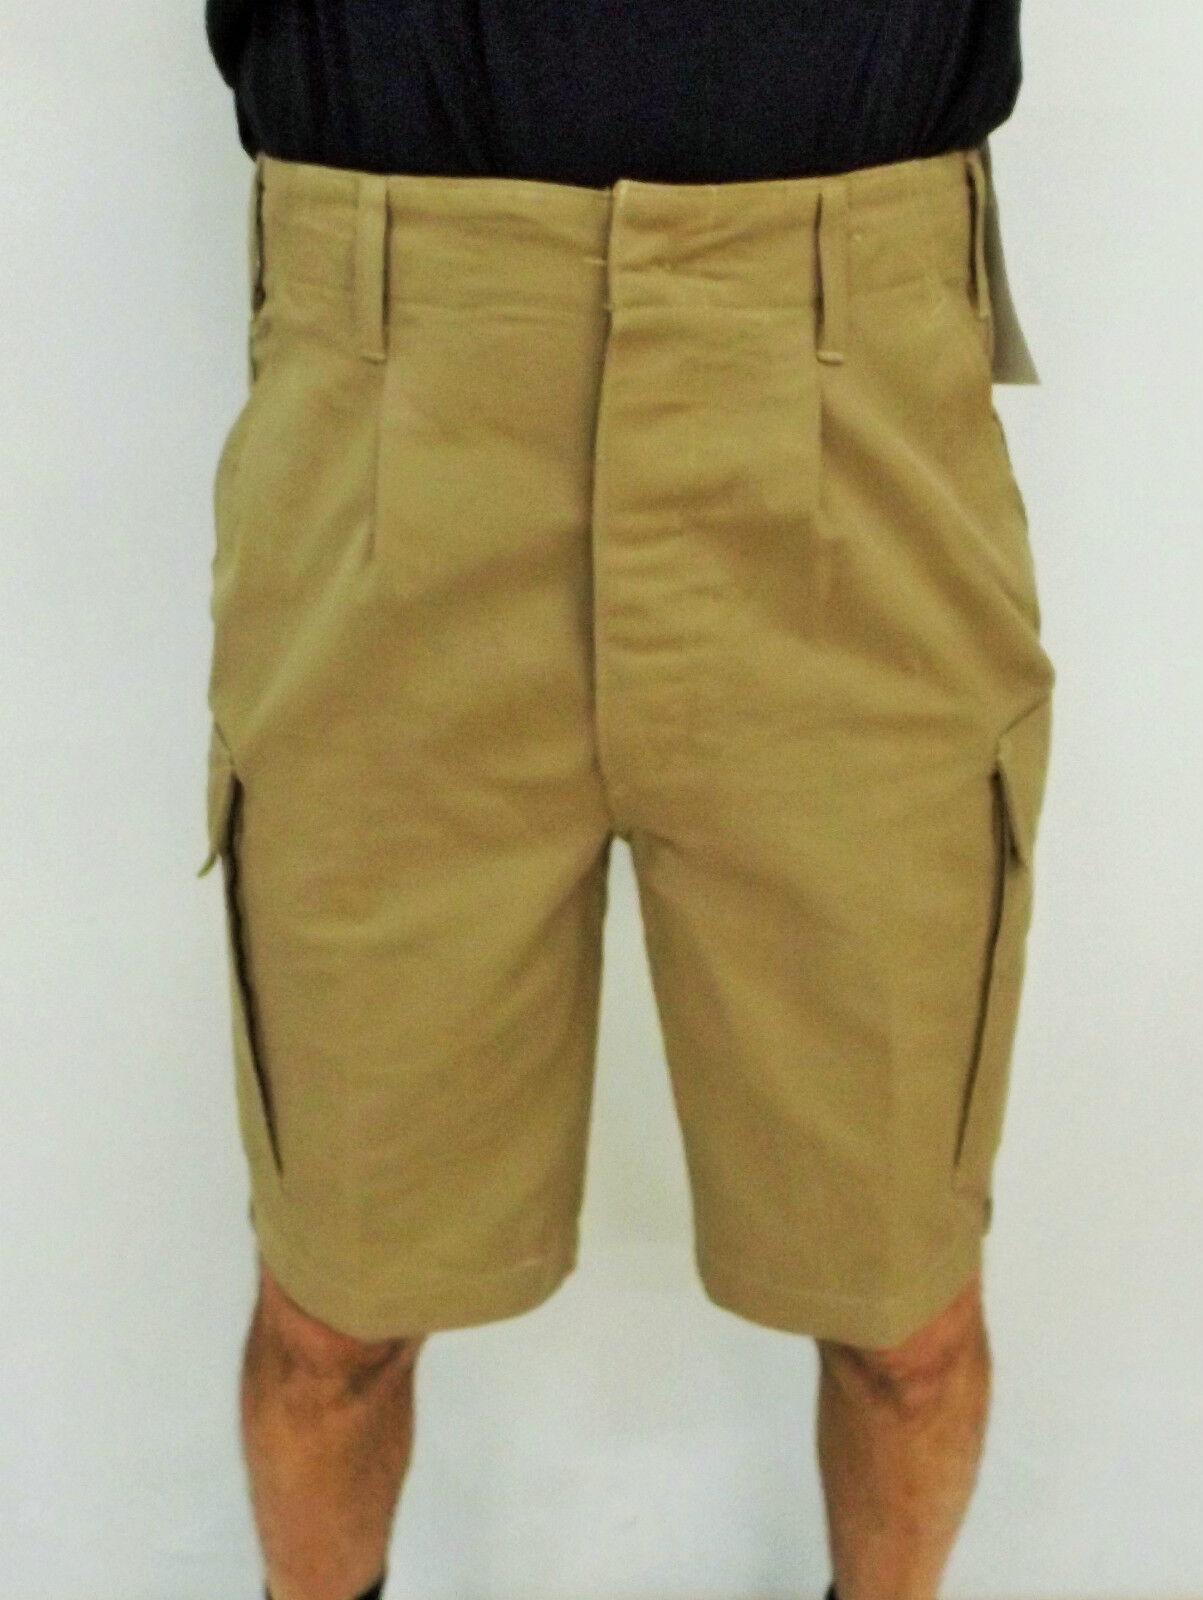 Original Leo Köhler Bw Shorts Tropical Khaki Bermuda Size  XL = 9 = 52 Moleskin